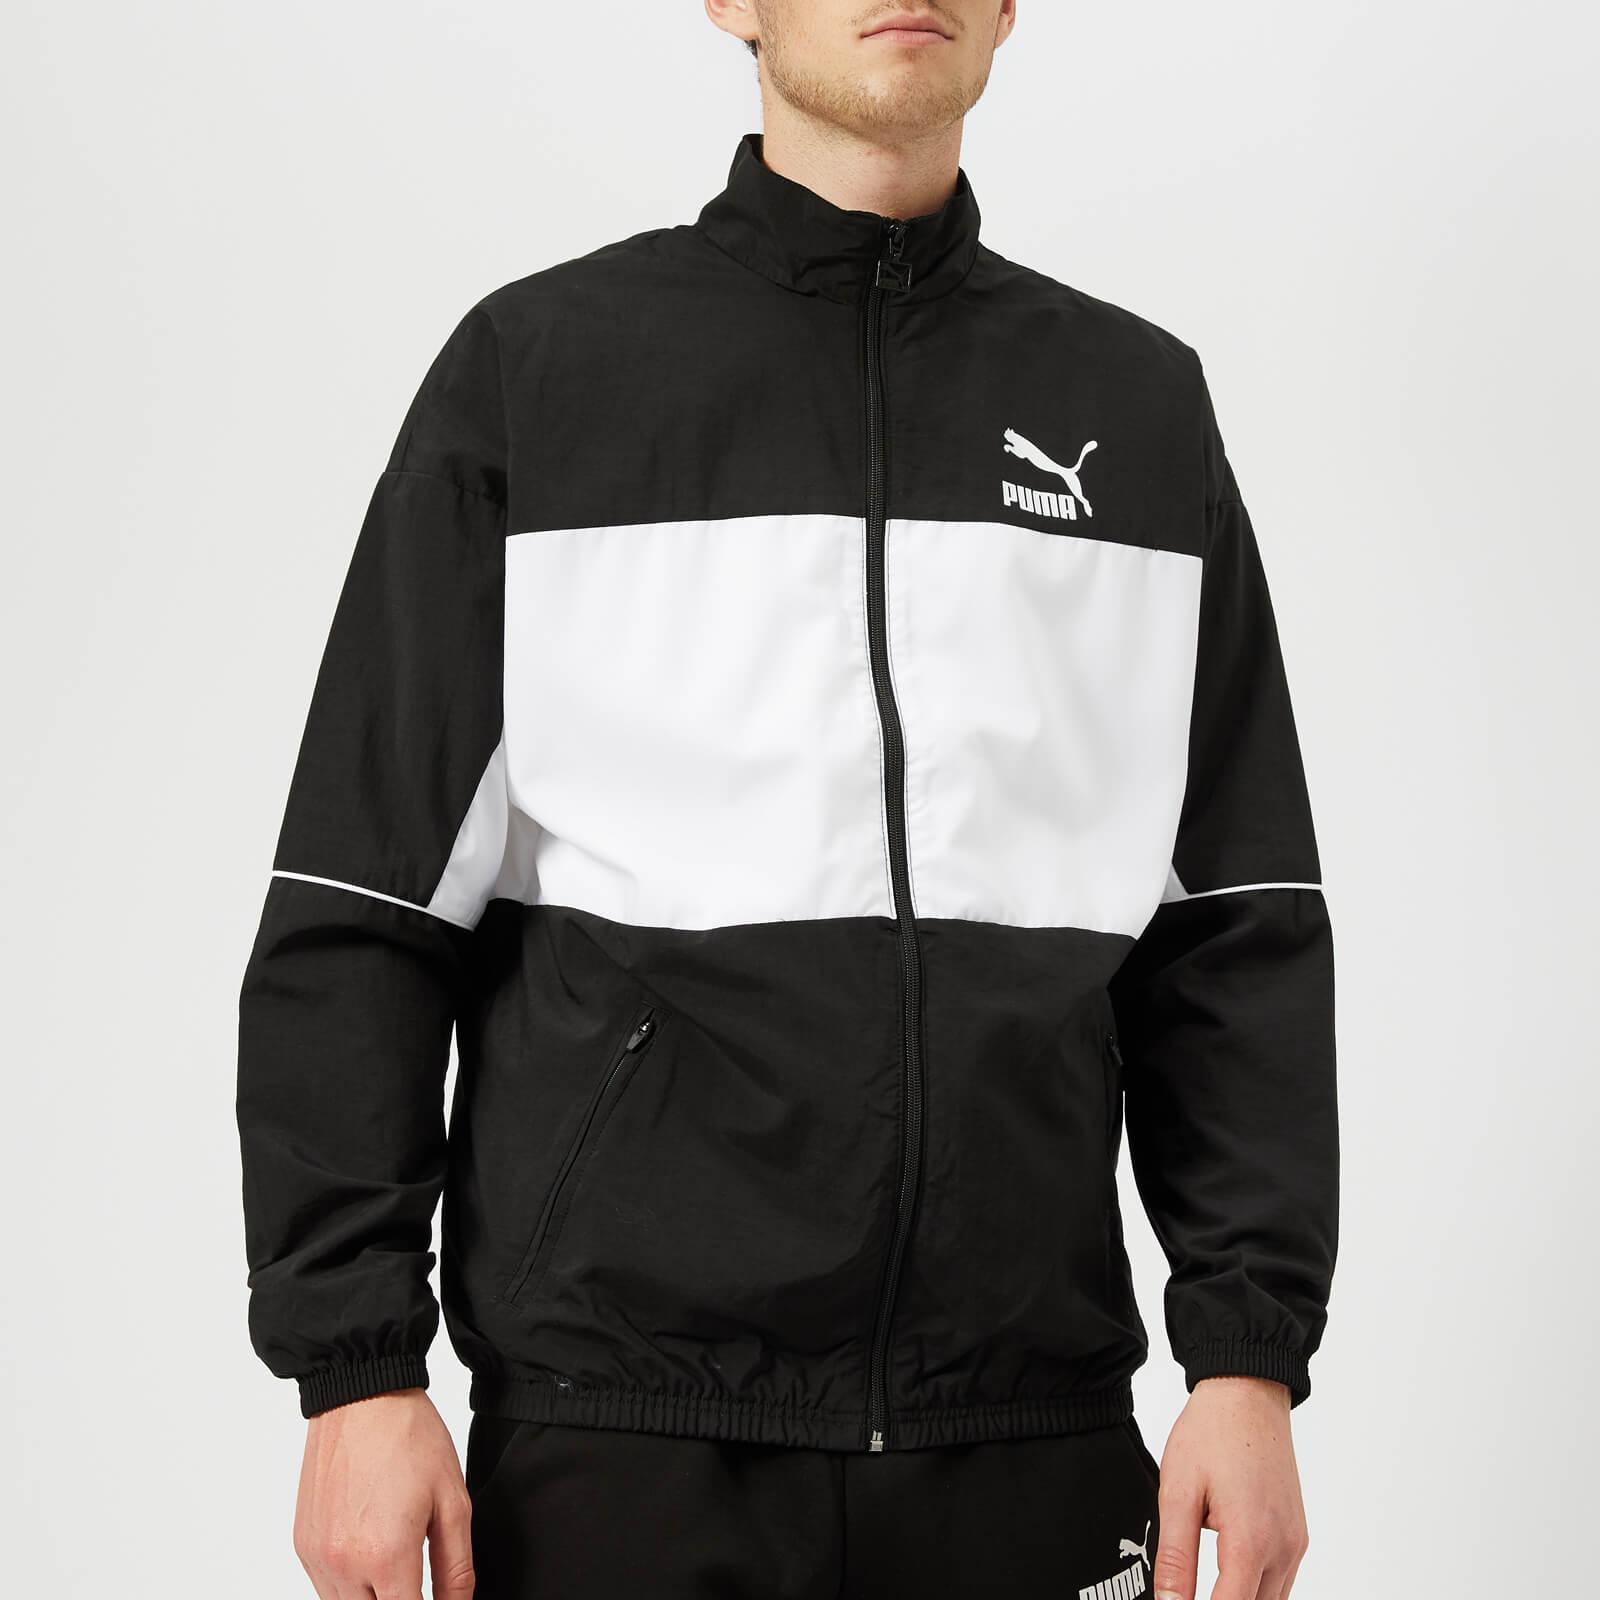 d3e39c112c64 Puma Men s Retro Woven Track Jacket - Puma Black Clothing